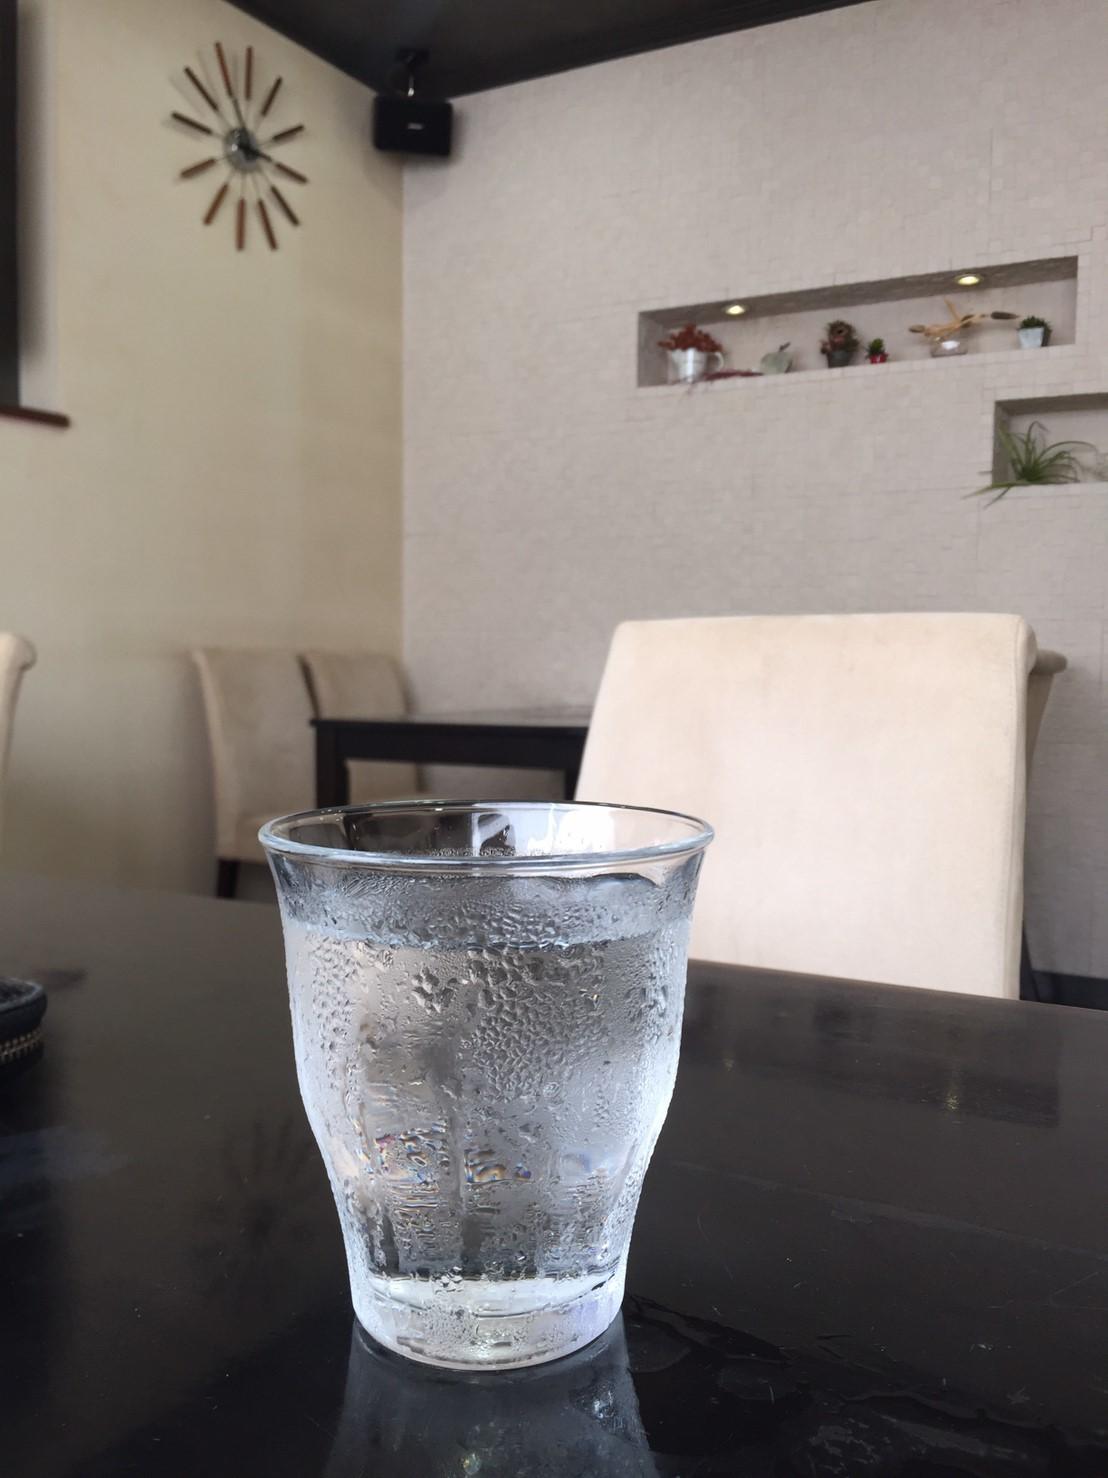 cafe & restaurant Andrews  日替わり  ジャンボ有頭海老フライ_e0115904_00362471.jpg